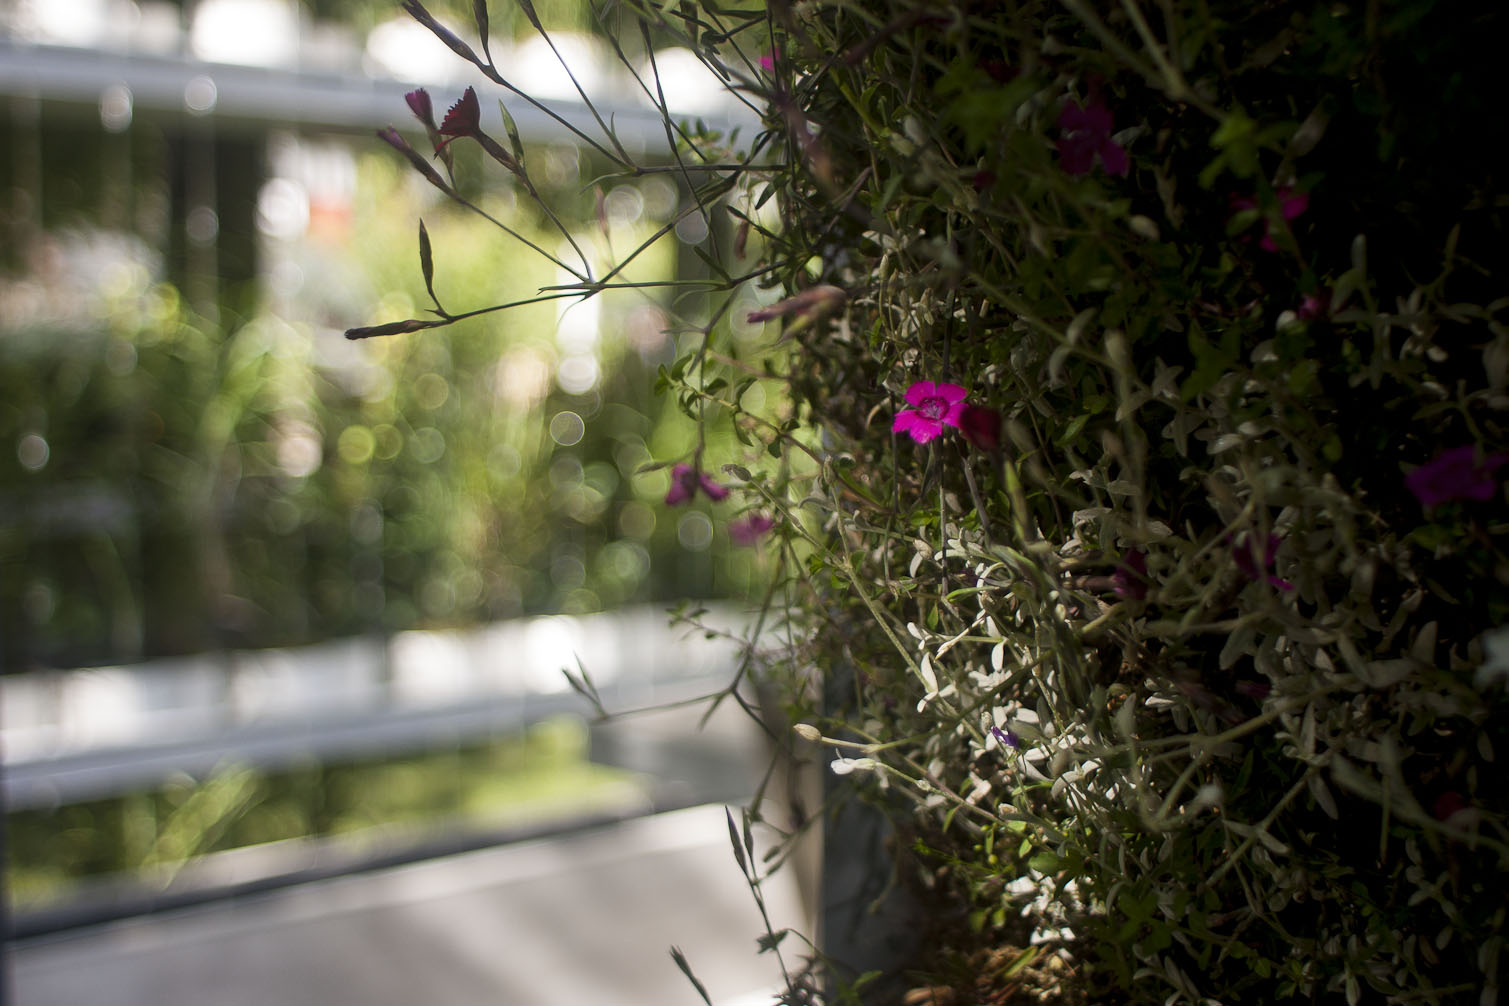 Jardins jardin aux tuileries 2014 un je ne sais quoi d co for Jardin tuileries